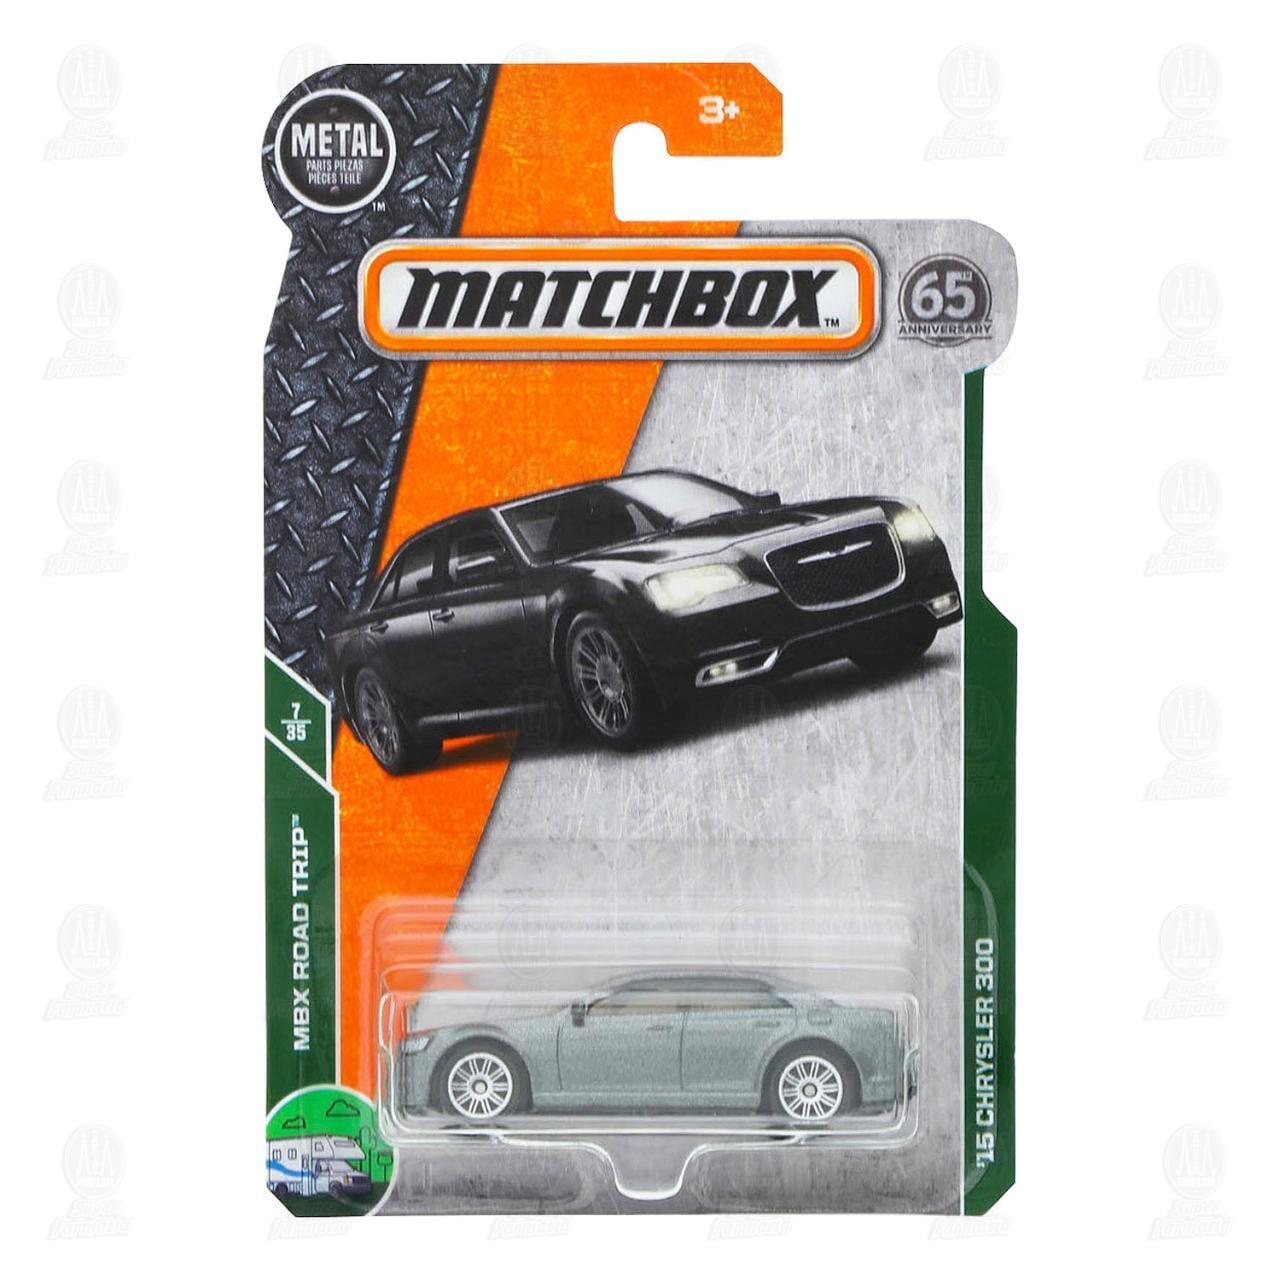 Vehículo Matchbox Diferentes Modelos, 1 pz.